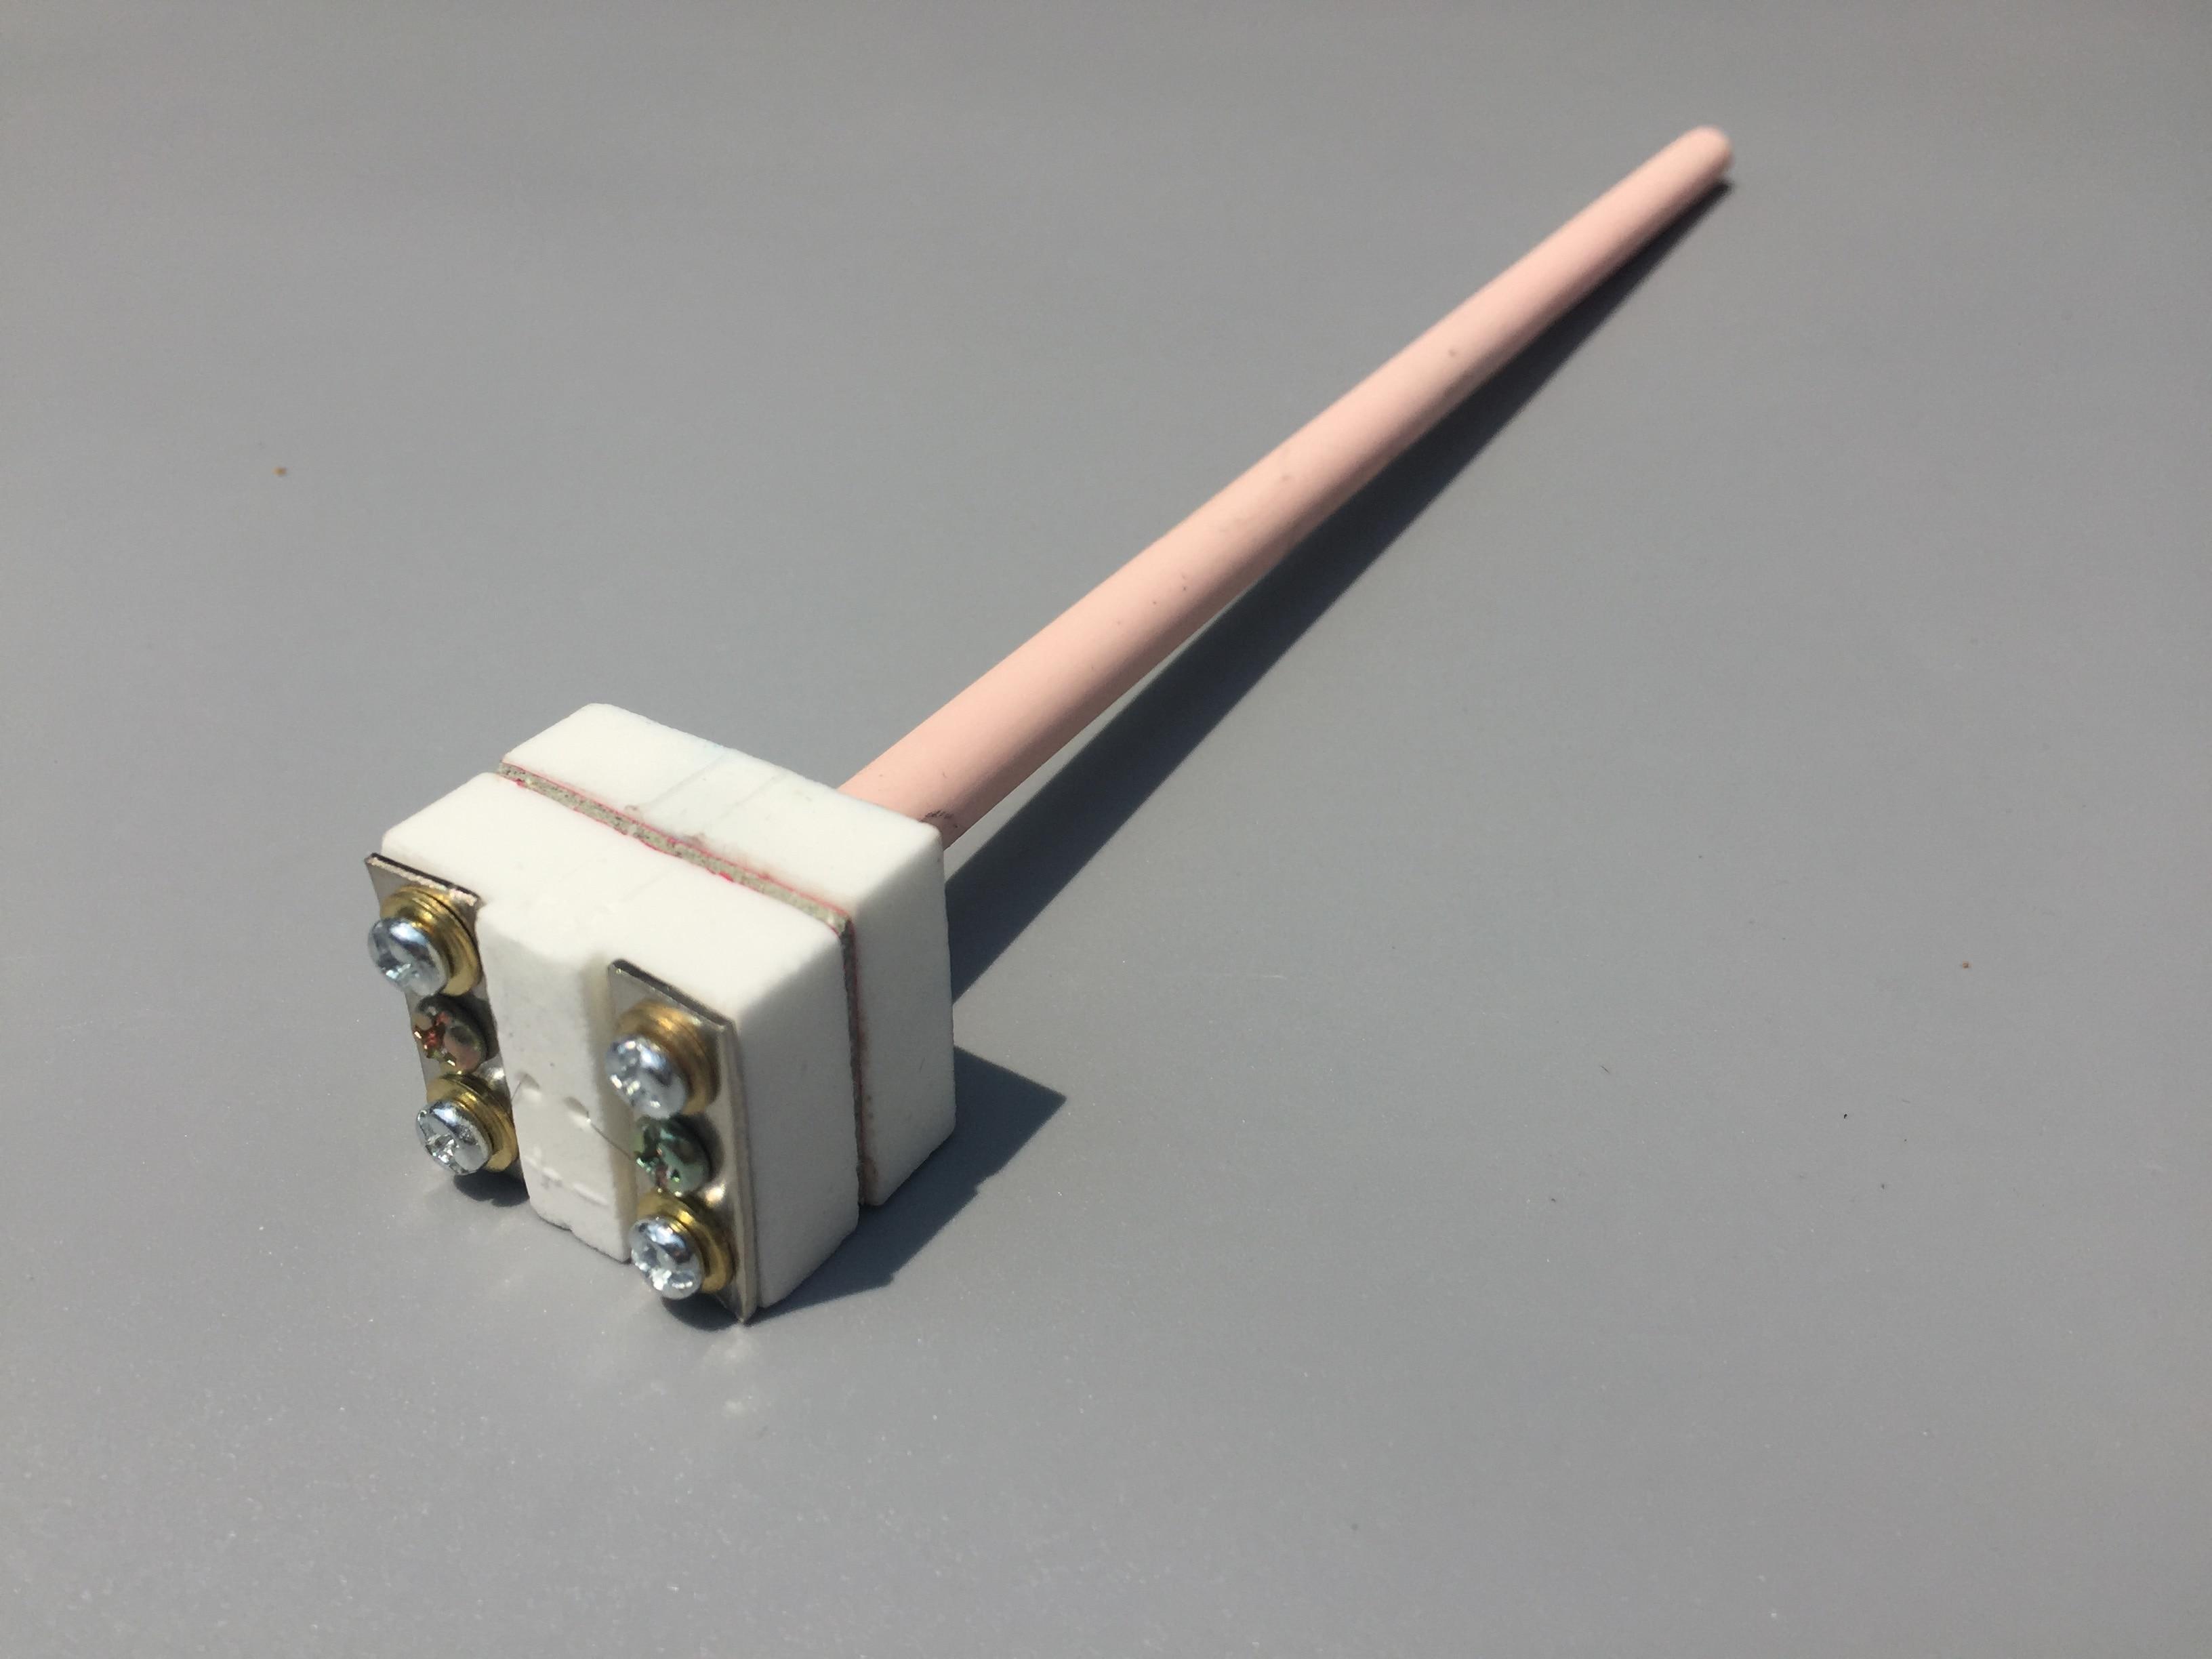 S Type B Type WRP-100 Platinum Rhodium Thermocouple Probe Temperature Sensor 1350 1800 Degree Celsius High Precision